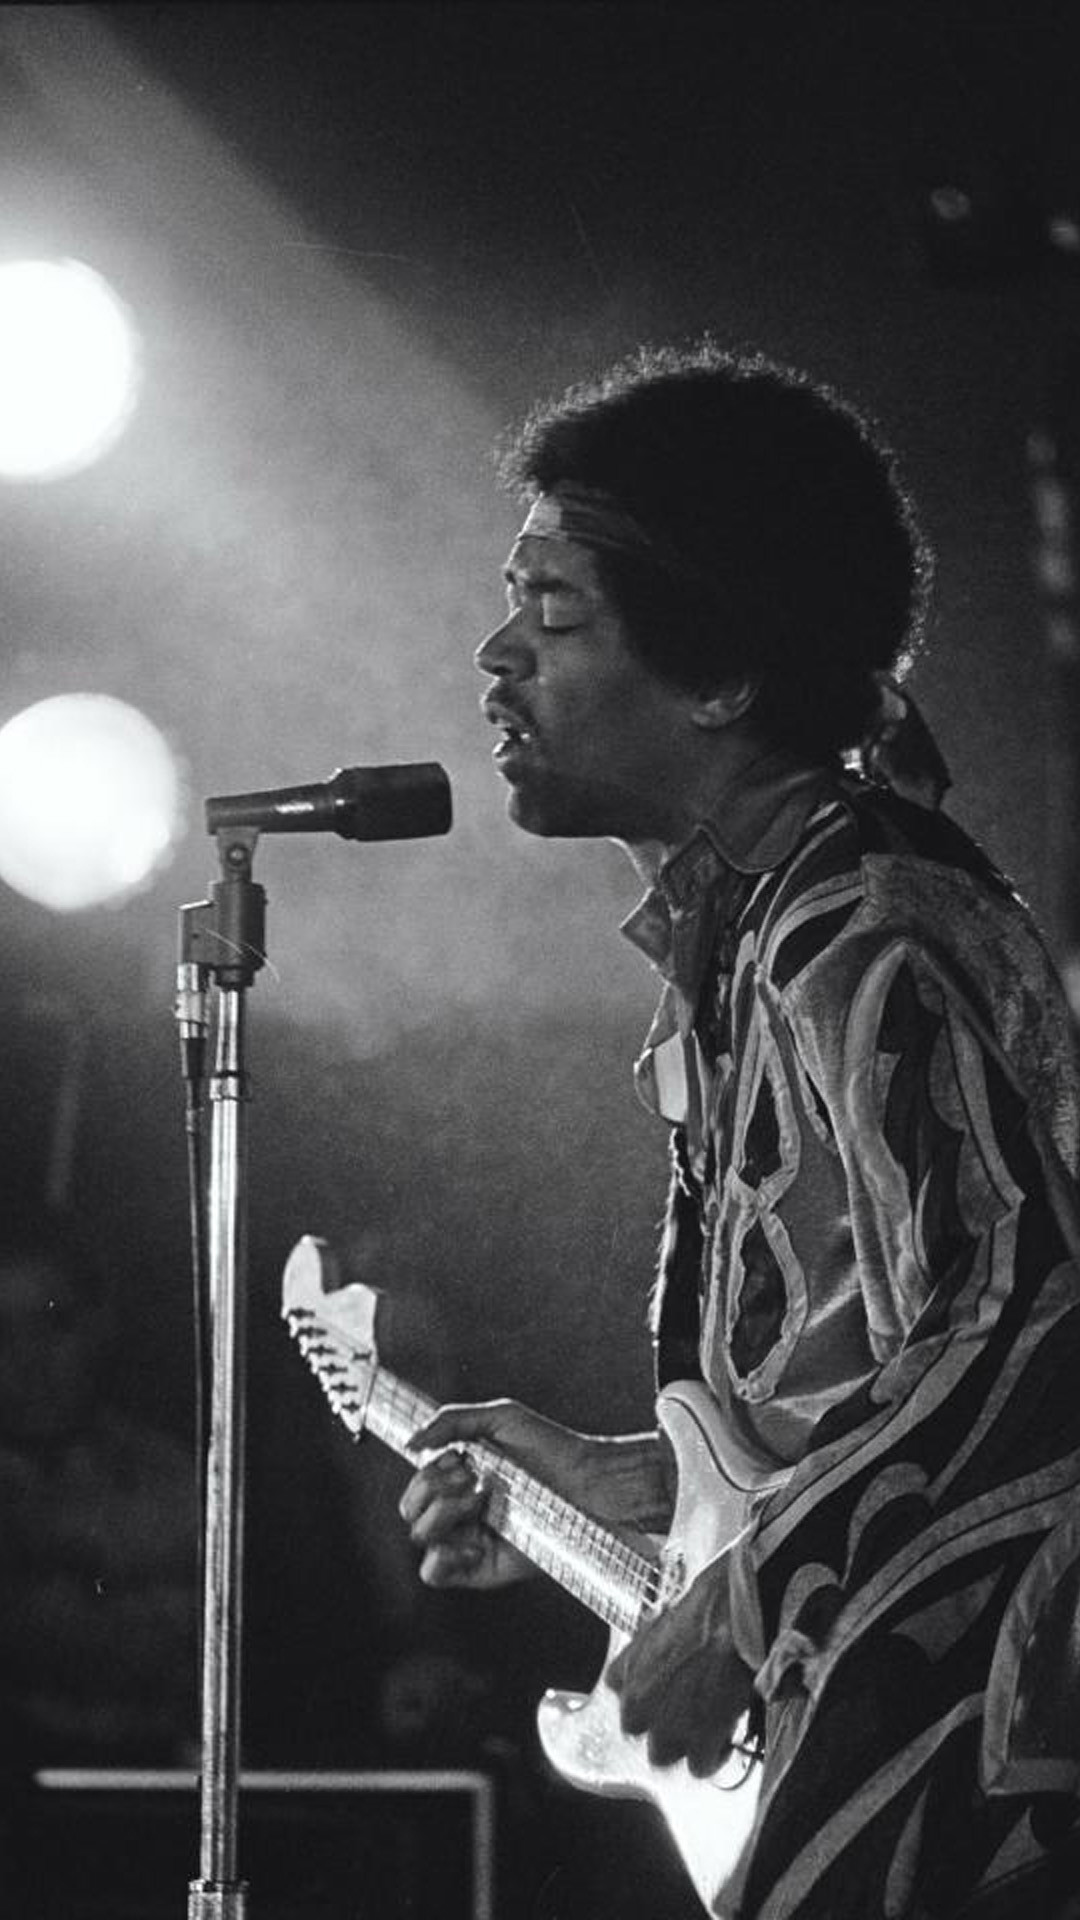 Jimi Hendrix Wallpaper 67 Images